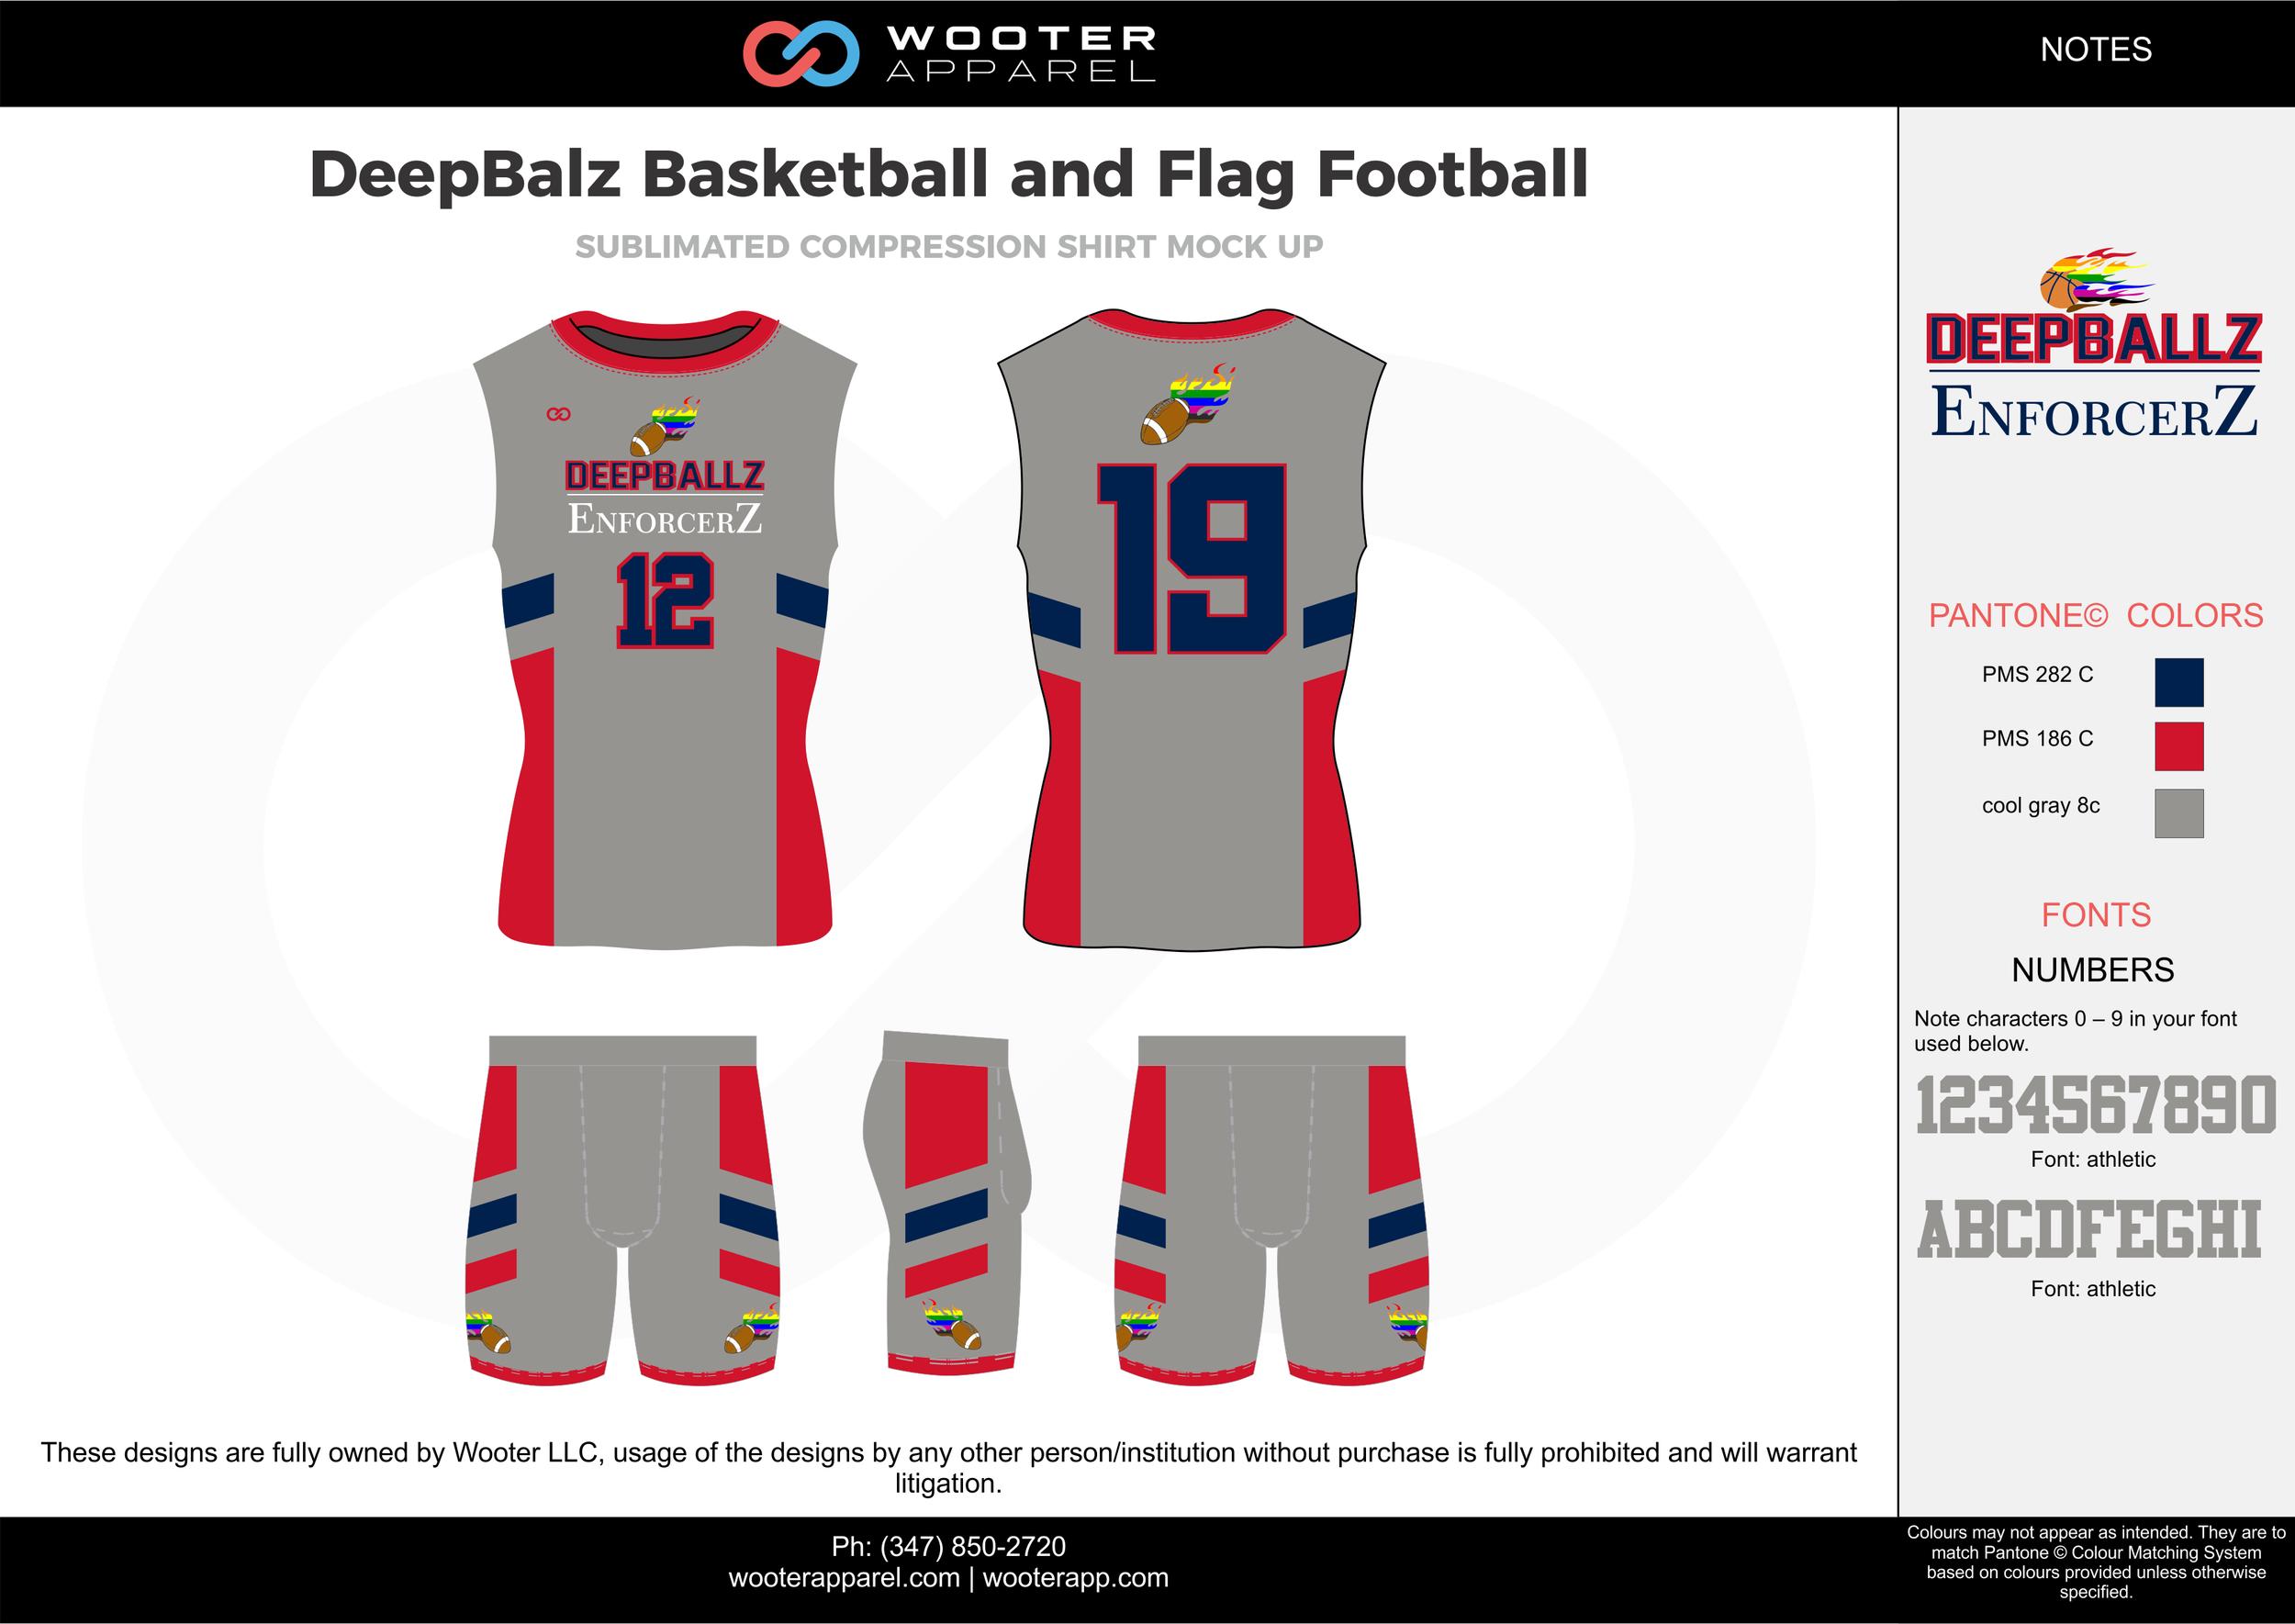 DeepBalz Basketball and Flag Football gray red blue flag football uniforms jerseys shorts